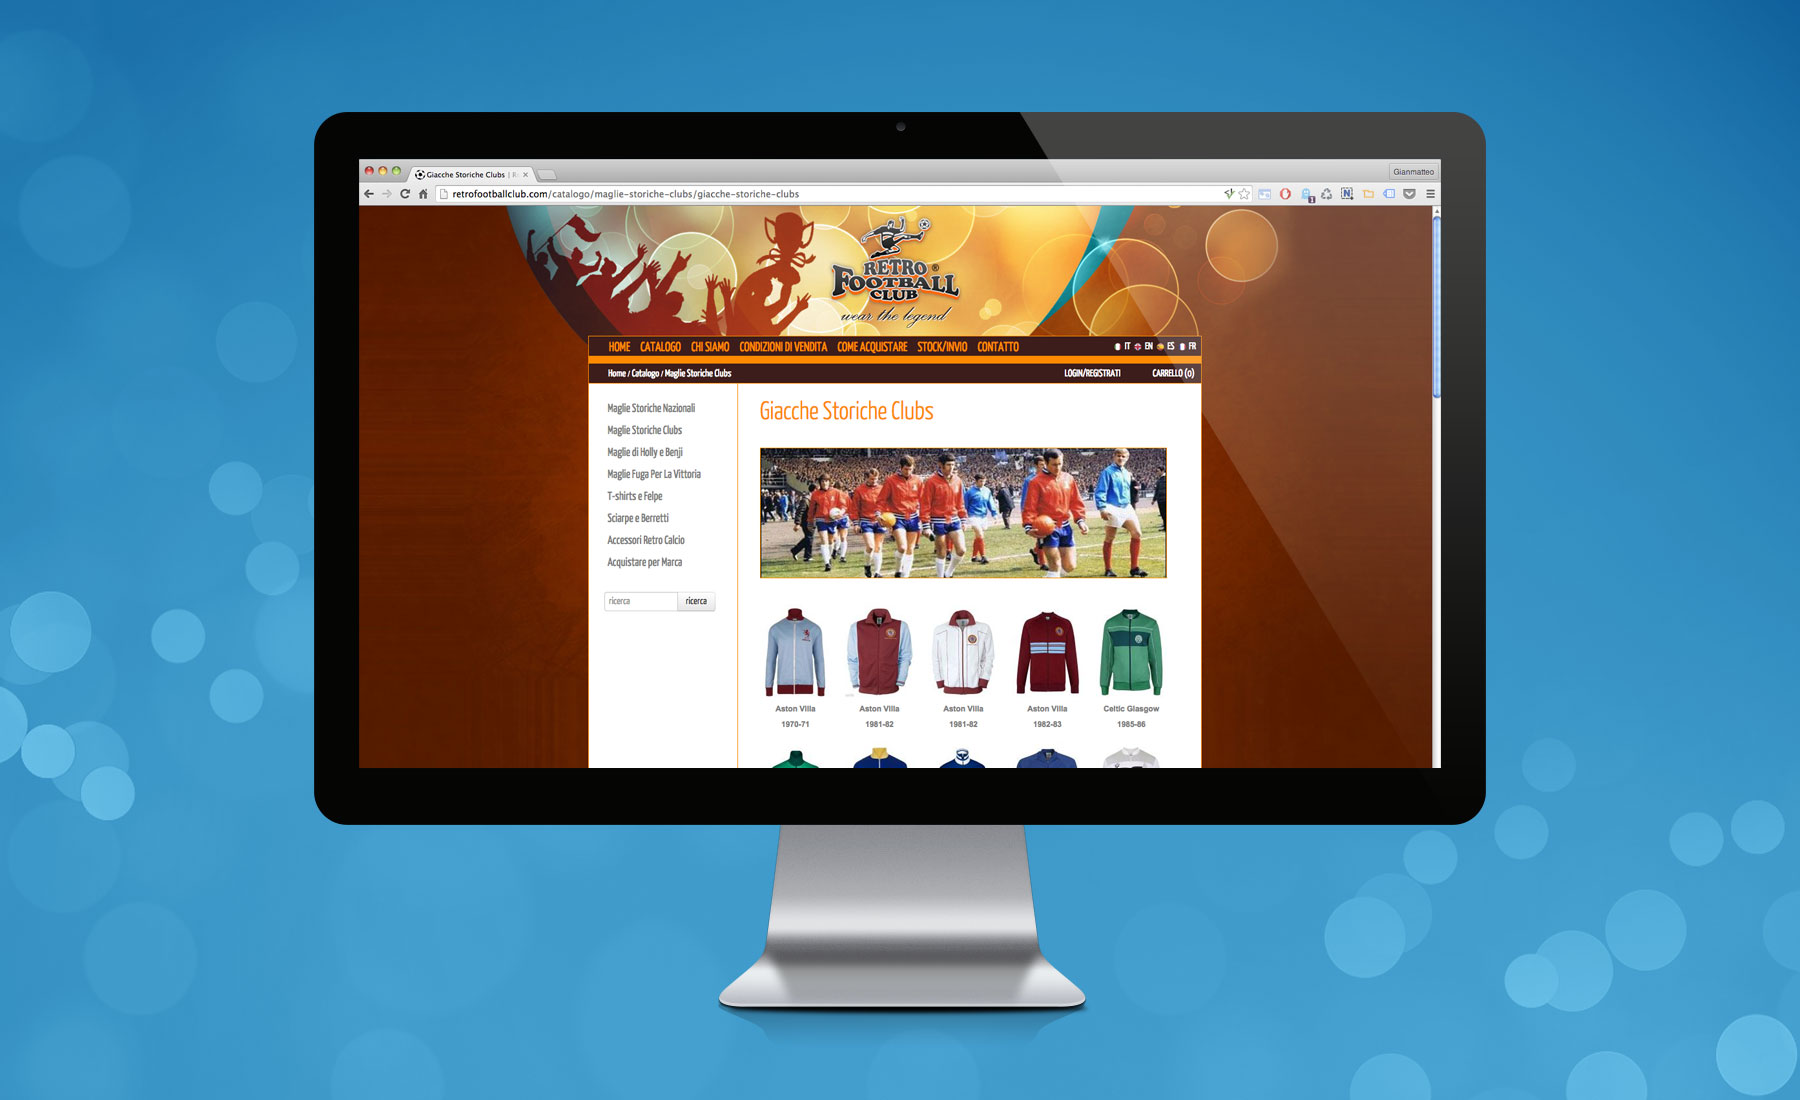 Sito Web Retrofootballclub